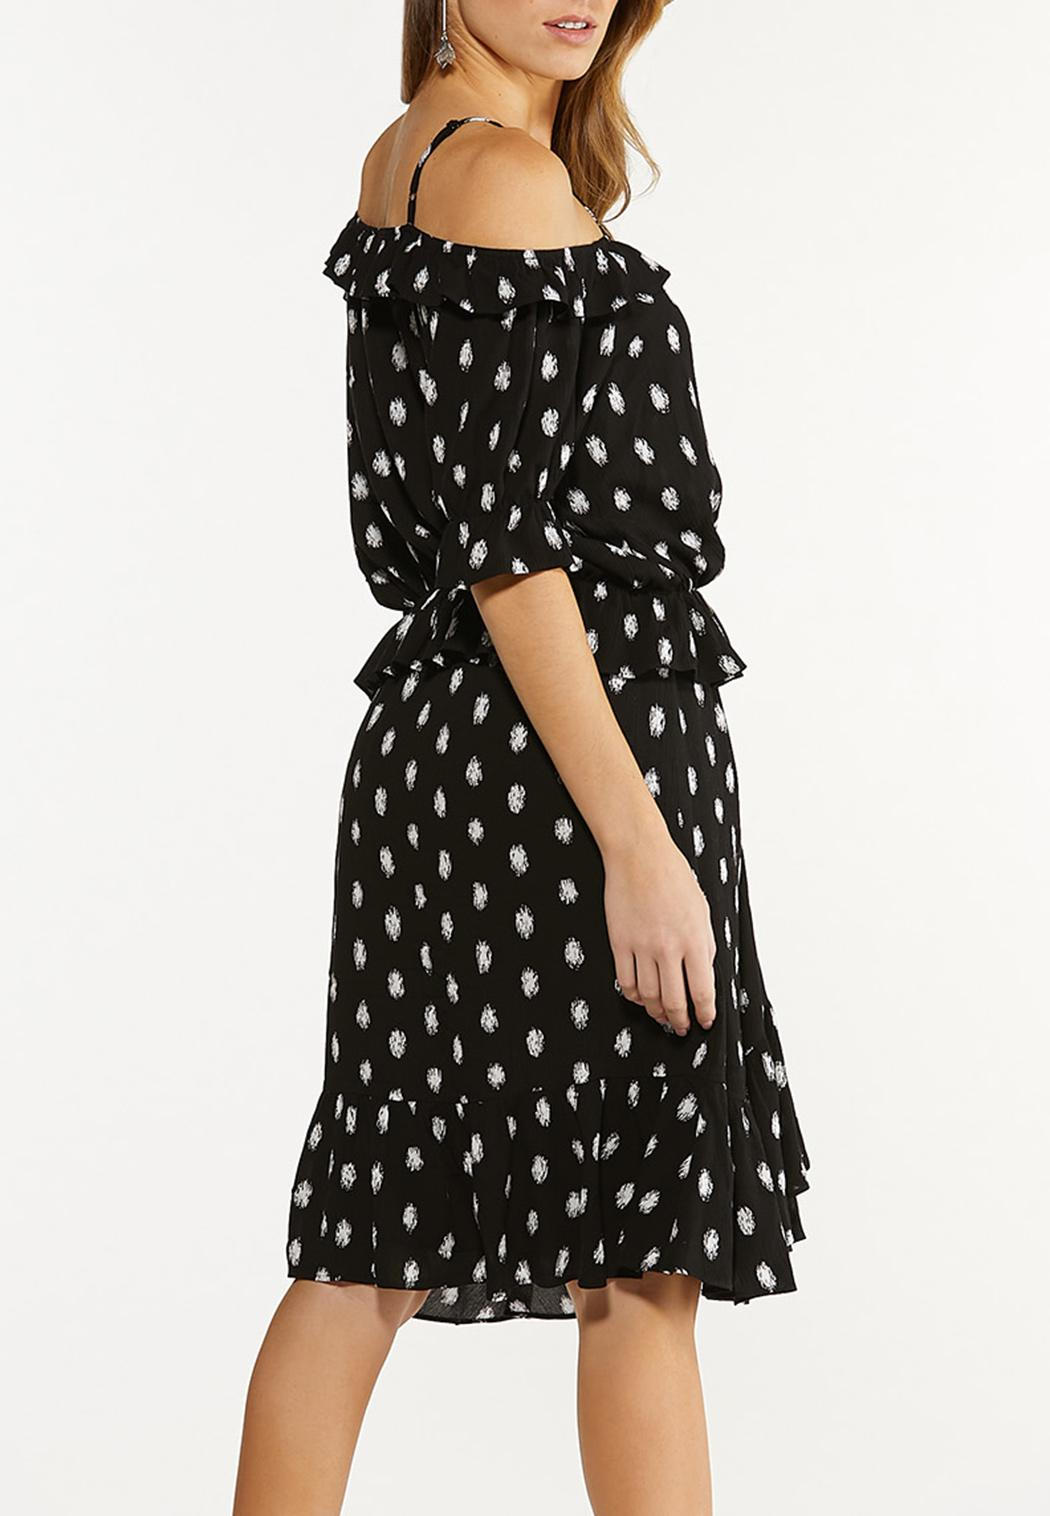 Fuzzy Dot Top And Skirt Set (Item #44295077)